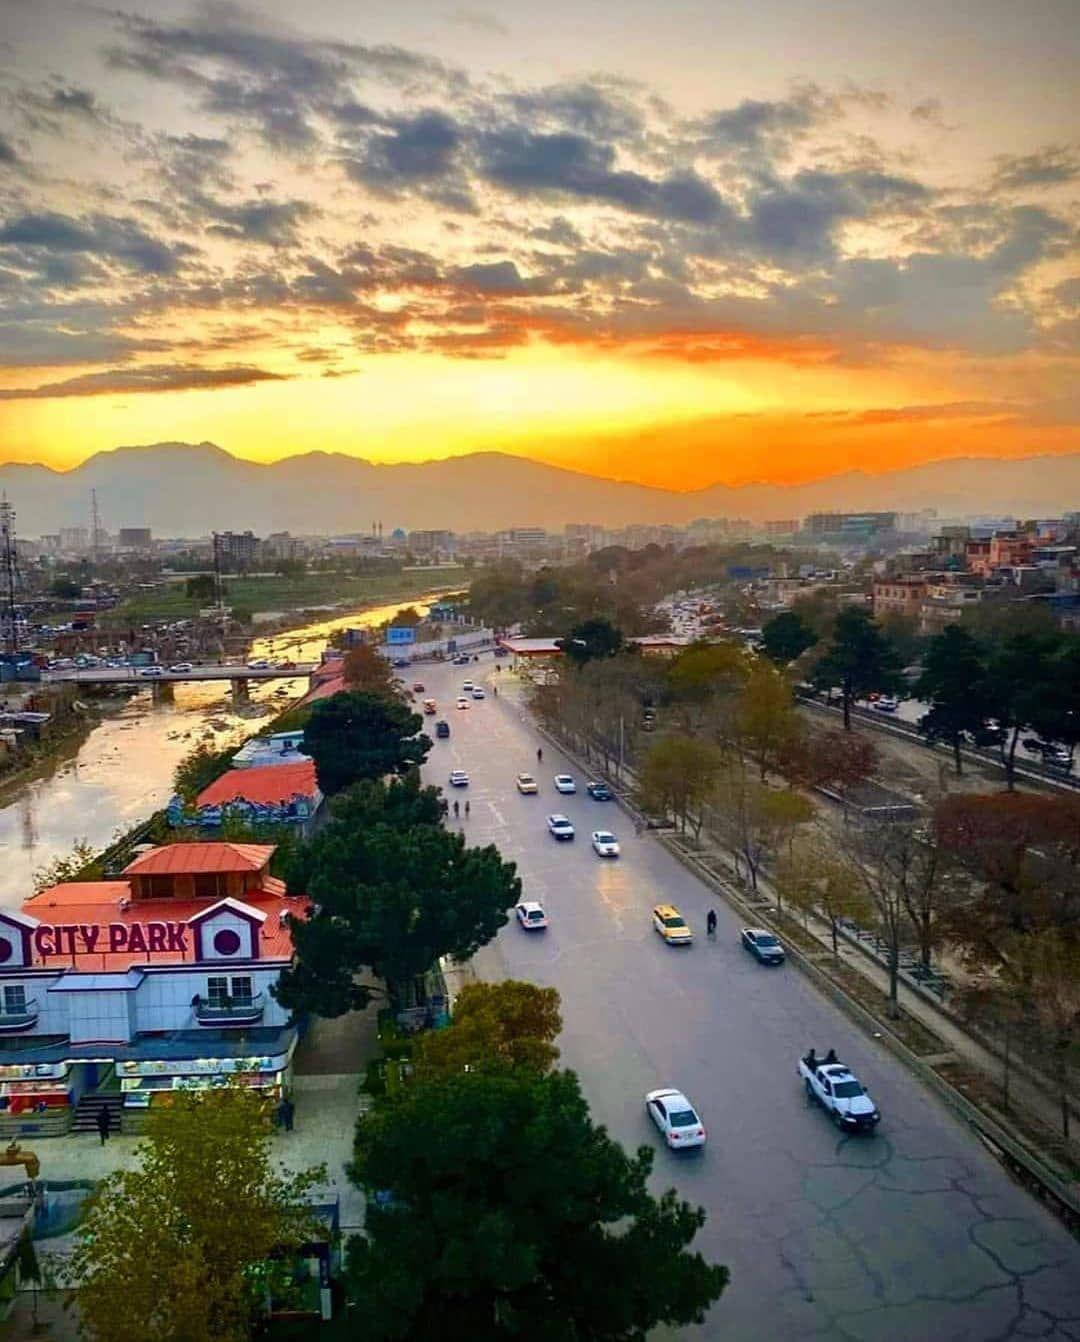 Gefallt 175 Mal 3 Kommentare افغانستان افتخار من Fficial Afghanistan My Proud Auf Instagram Afghanistan Afghan Kabul Afghanwedding Afghang